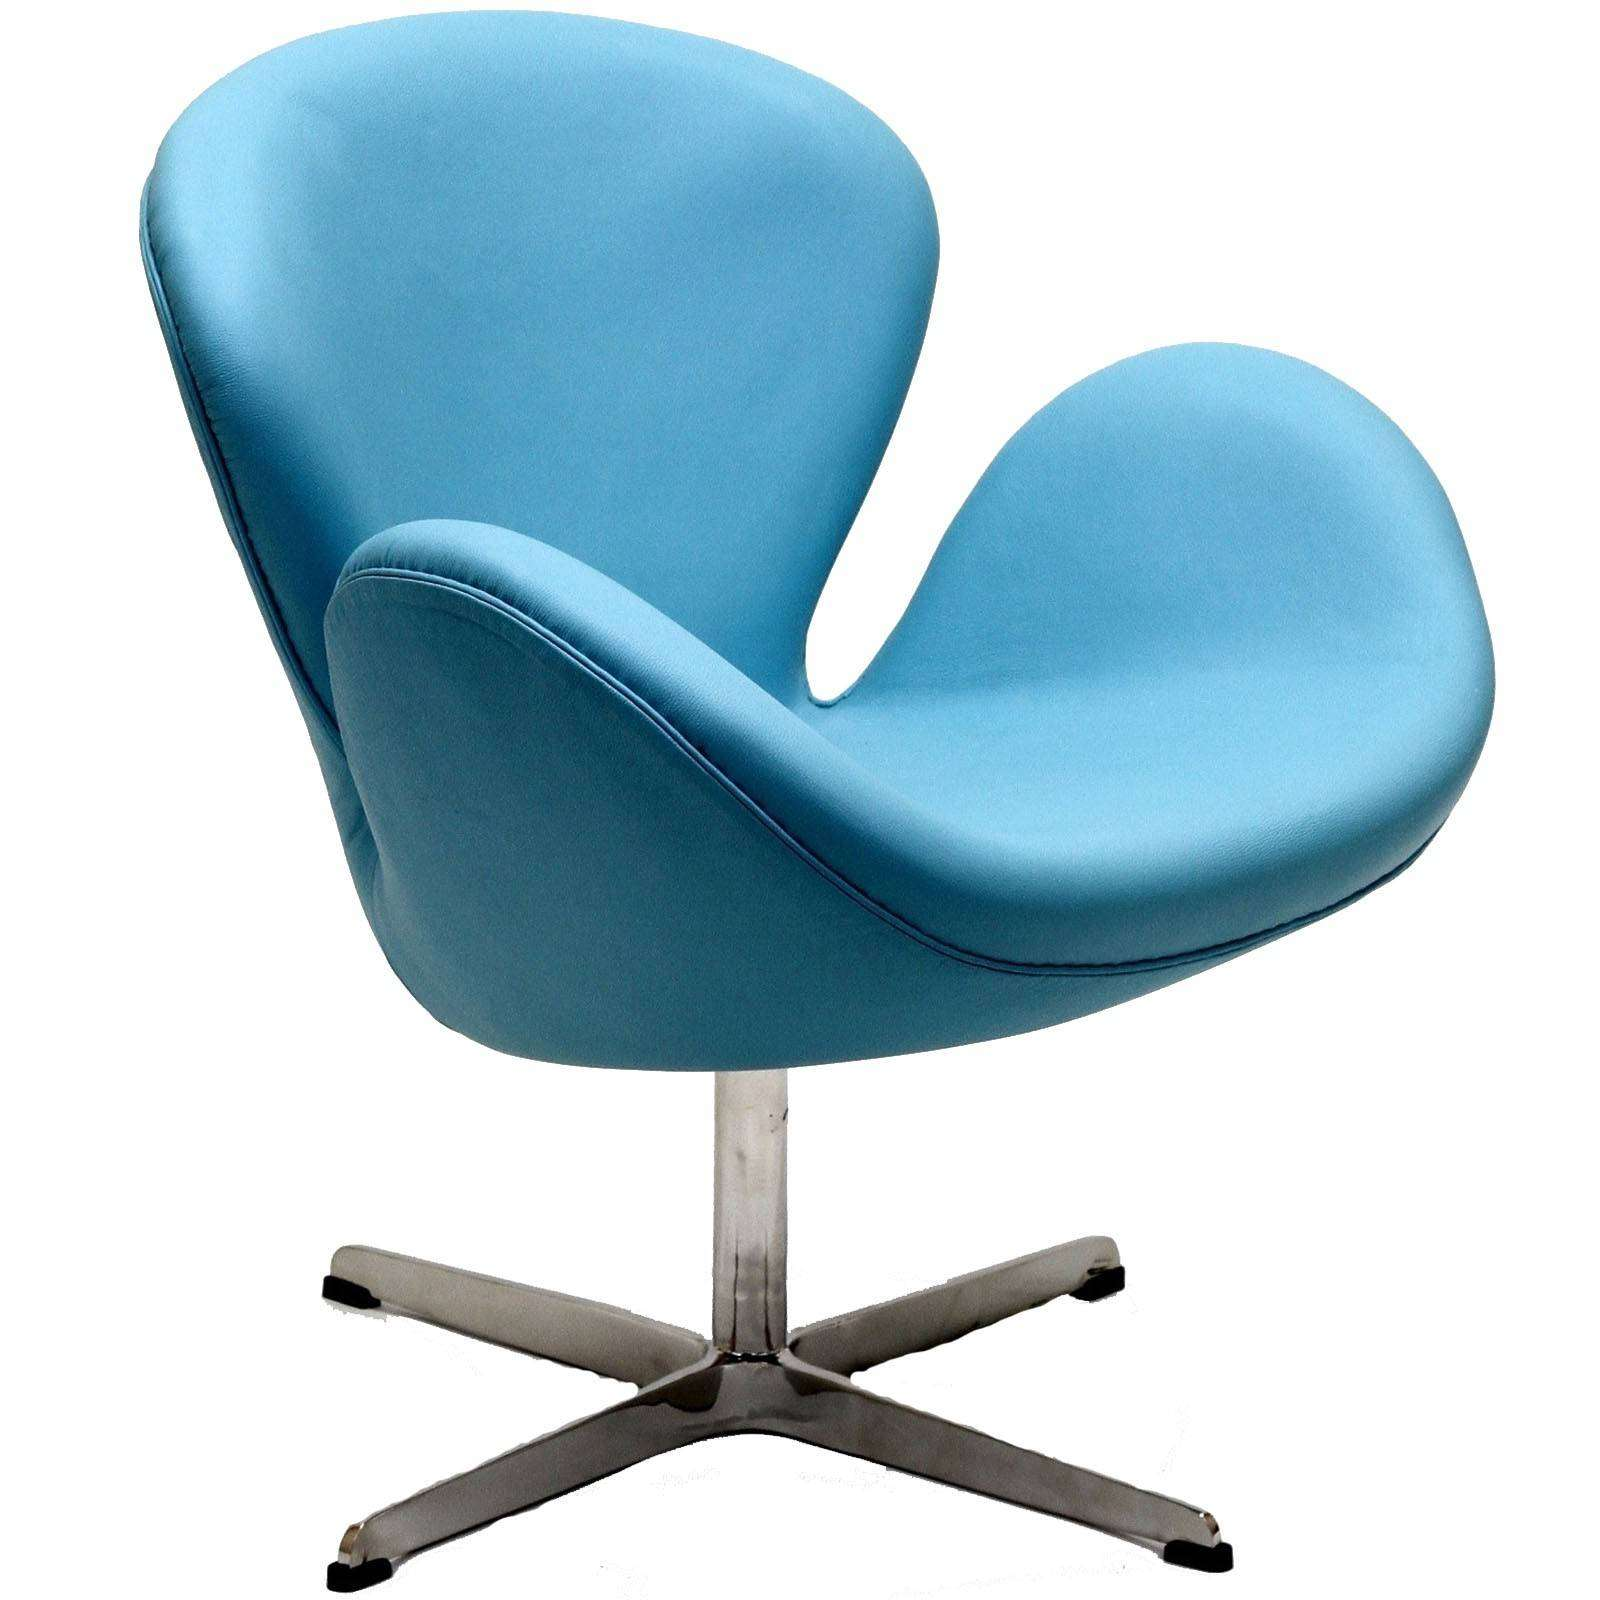 arne jacobsen swan chair lightweight aluminum patio chairs leather